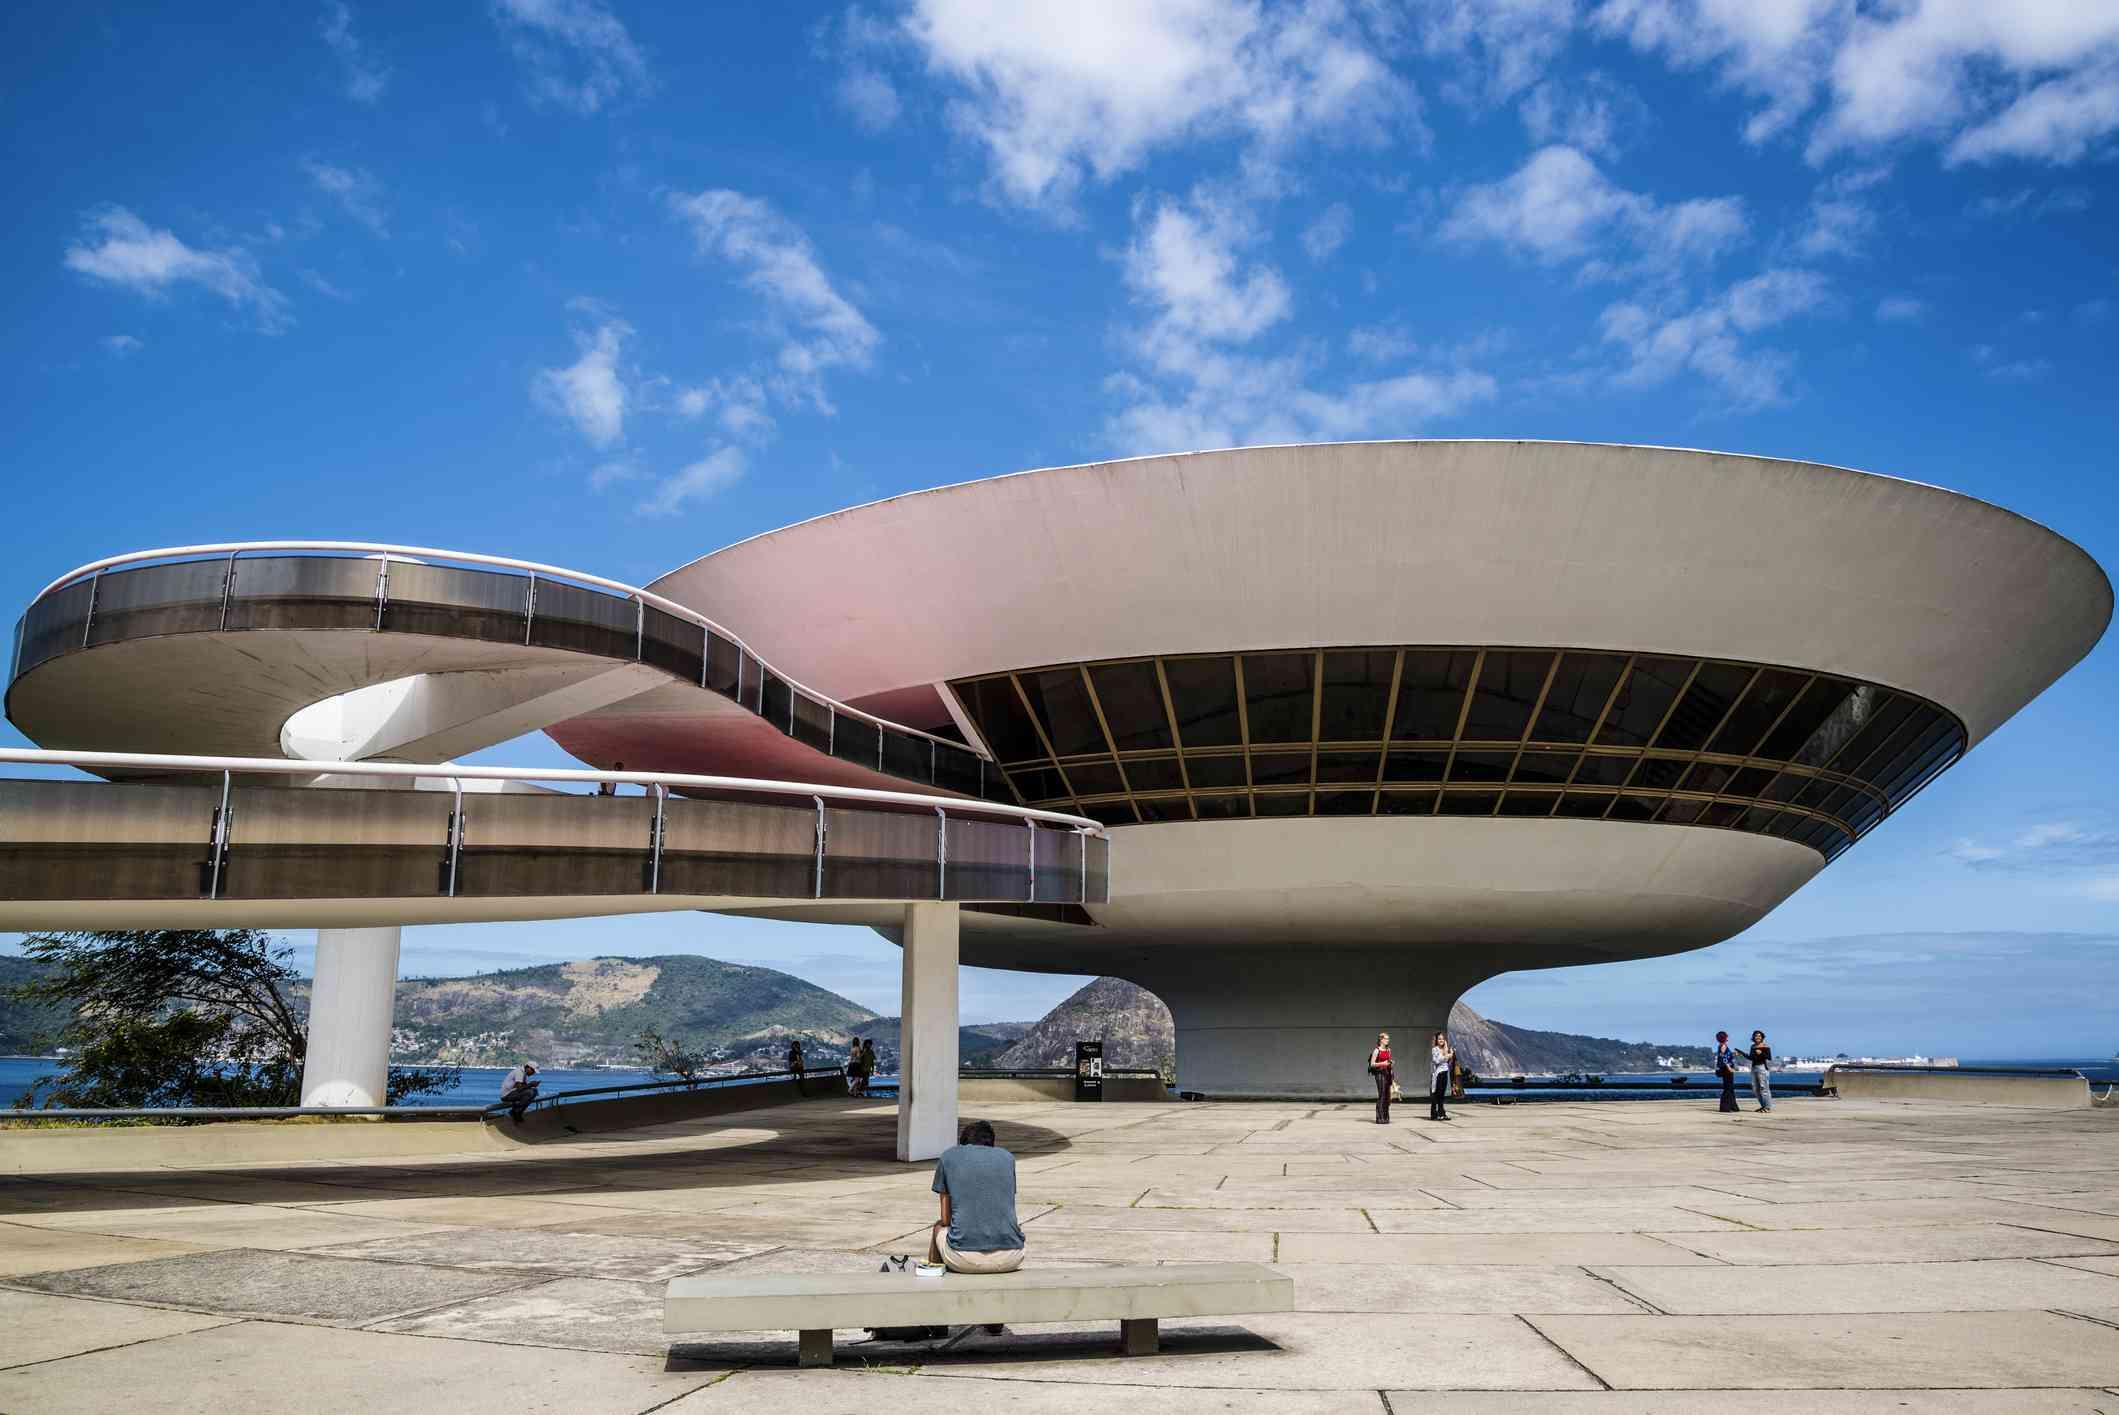 Niteroi Contemporary Art Museum, Brazil